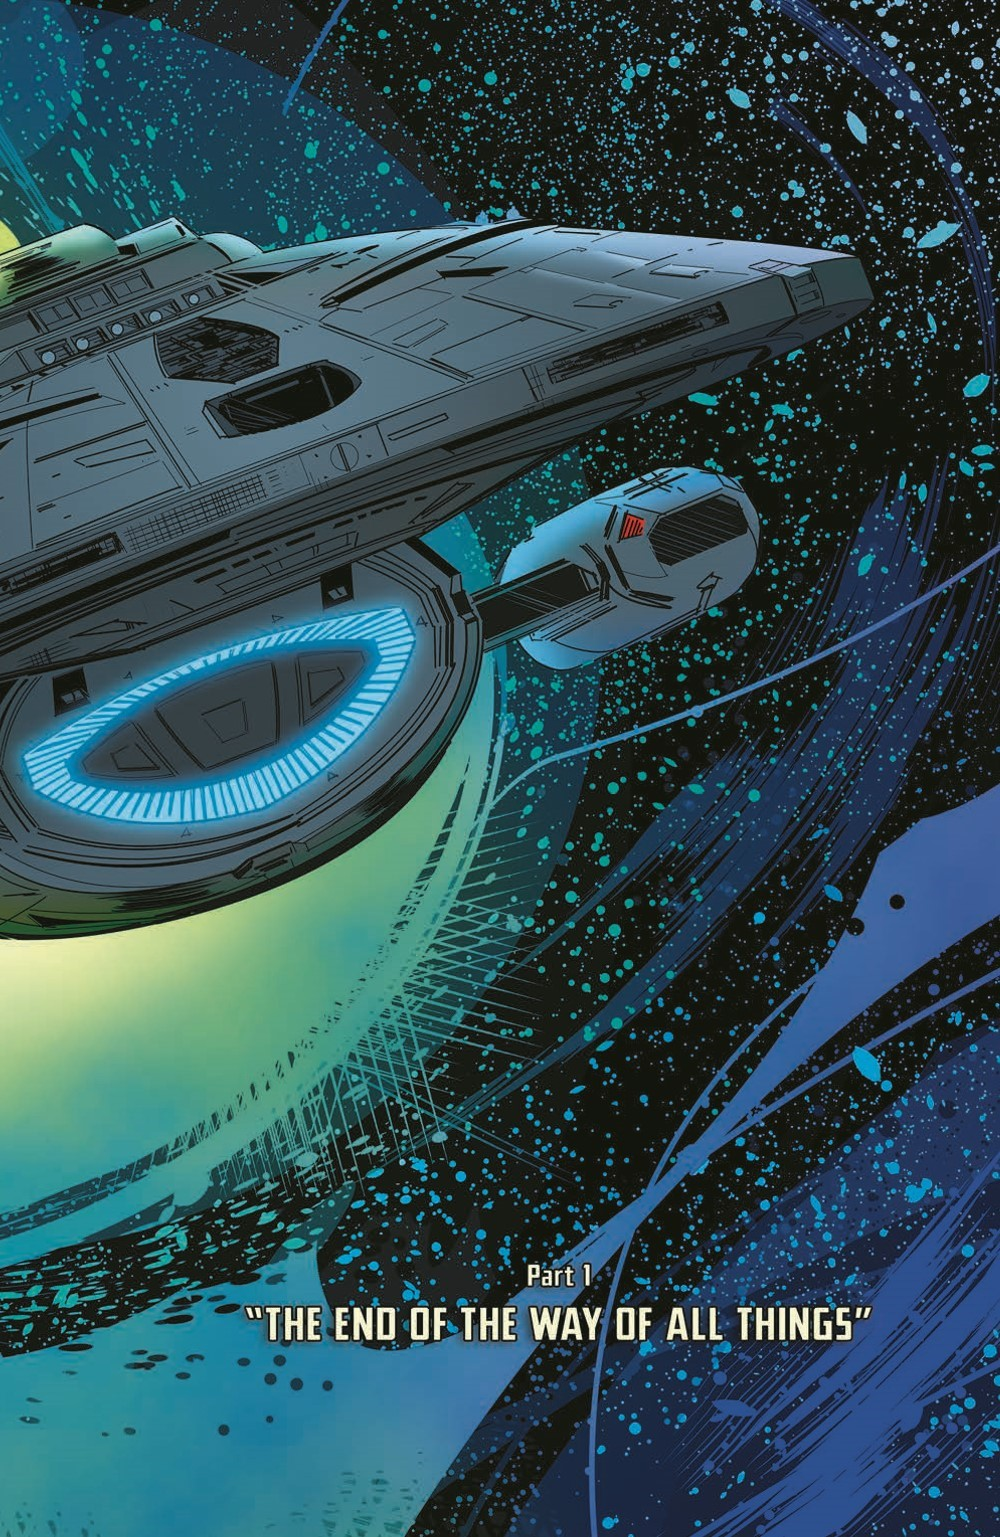 STV_SevensRekoning_TPB_pr-6 ComicList Previews: STAR TREK VOYAGER SEVEN'S RECKONING TP